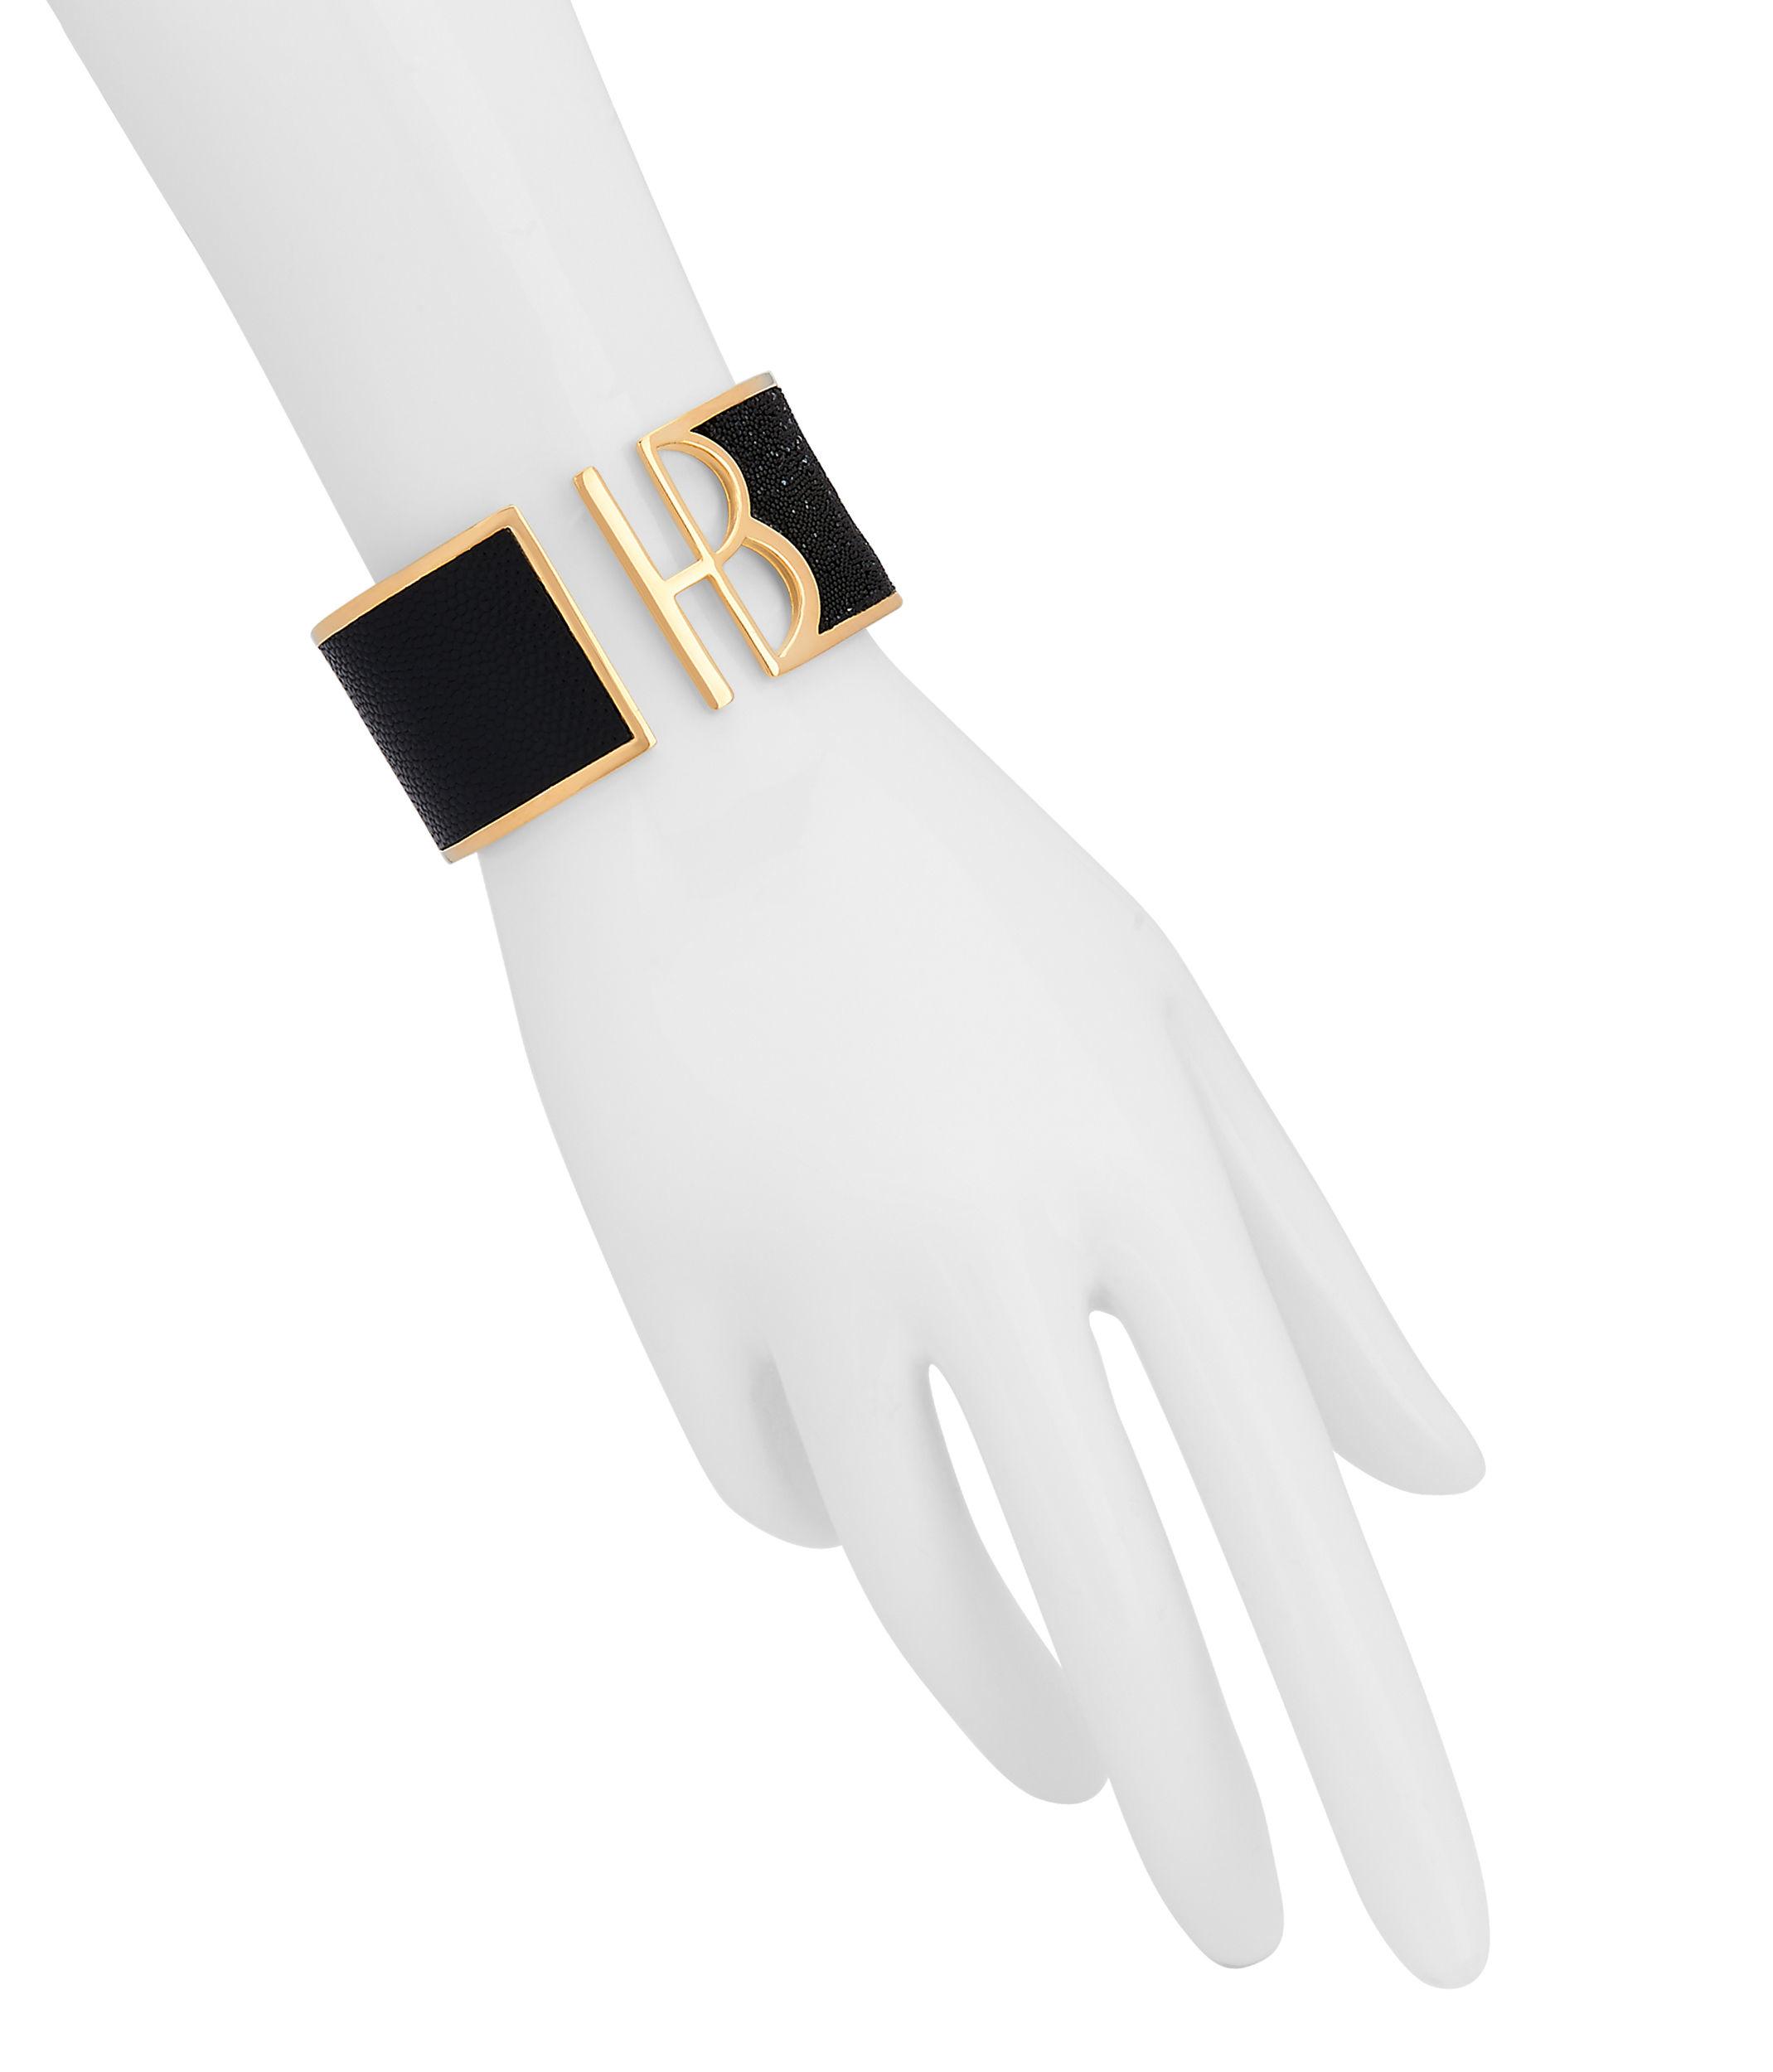 Lyst - Henri bendel Logo Metropolitan Cuff in Black